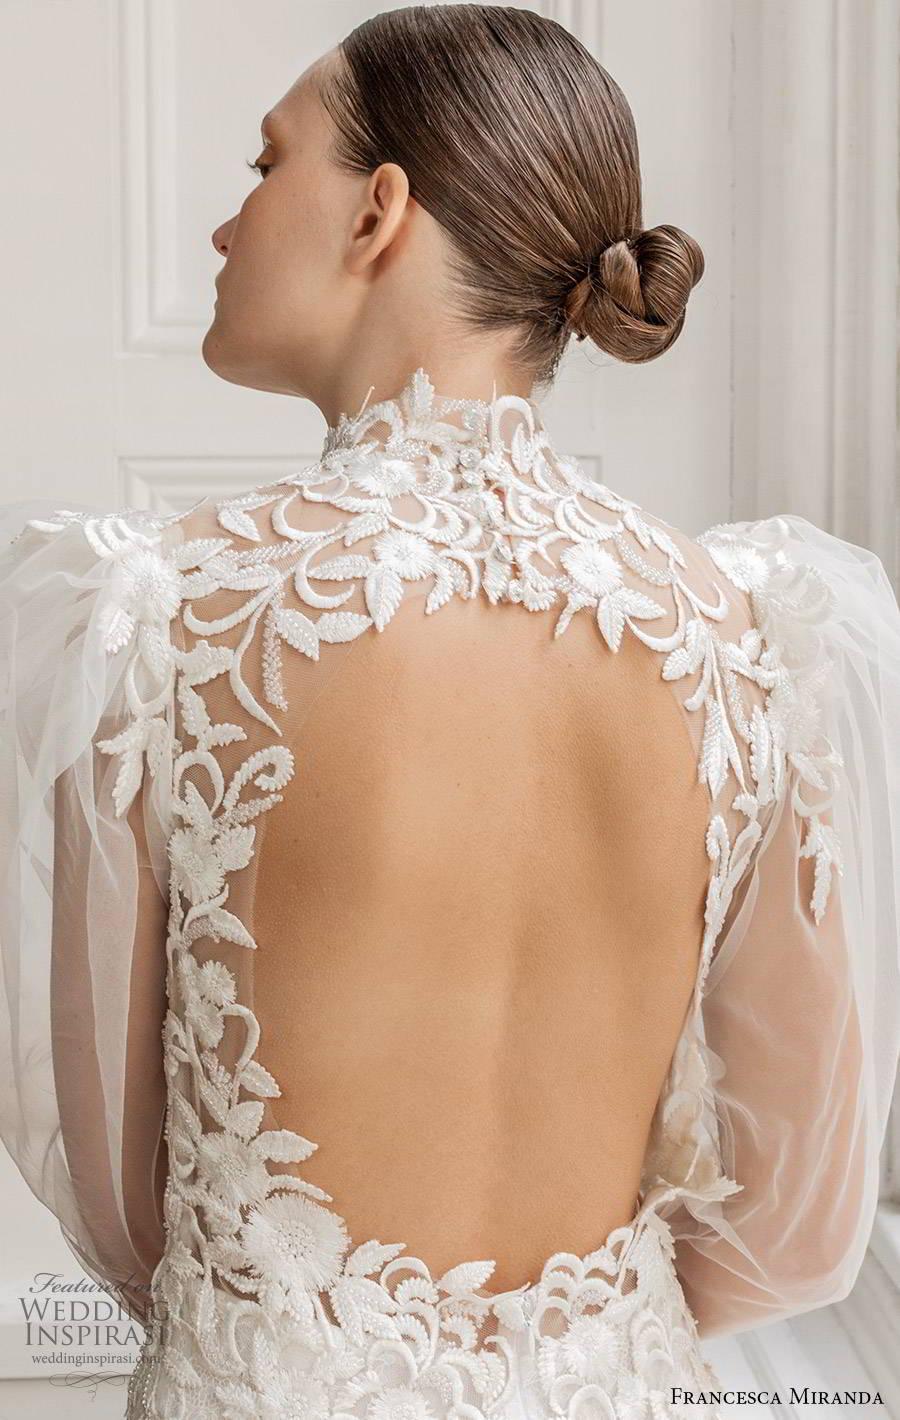 francesca miranda spring 2020 bridal illusion long puff sleeves high neckline fully embellished lace sheath wedding dress modern vintage elegant keyhole back (5) bv